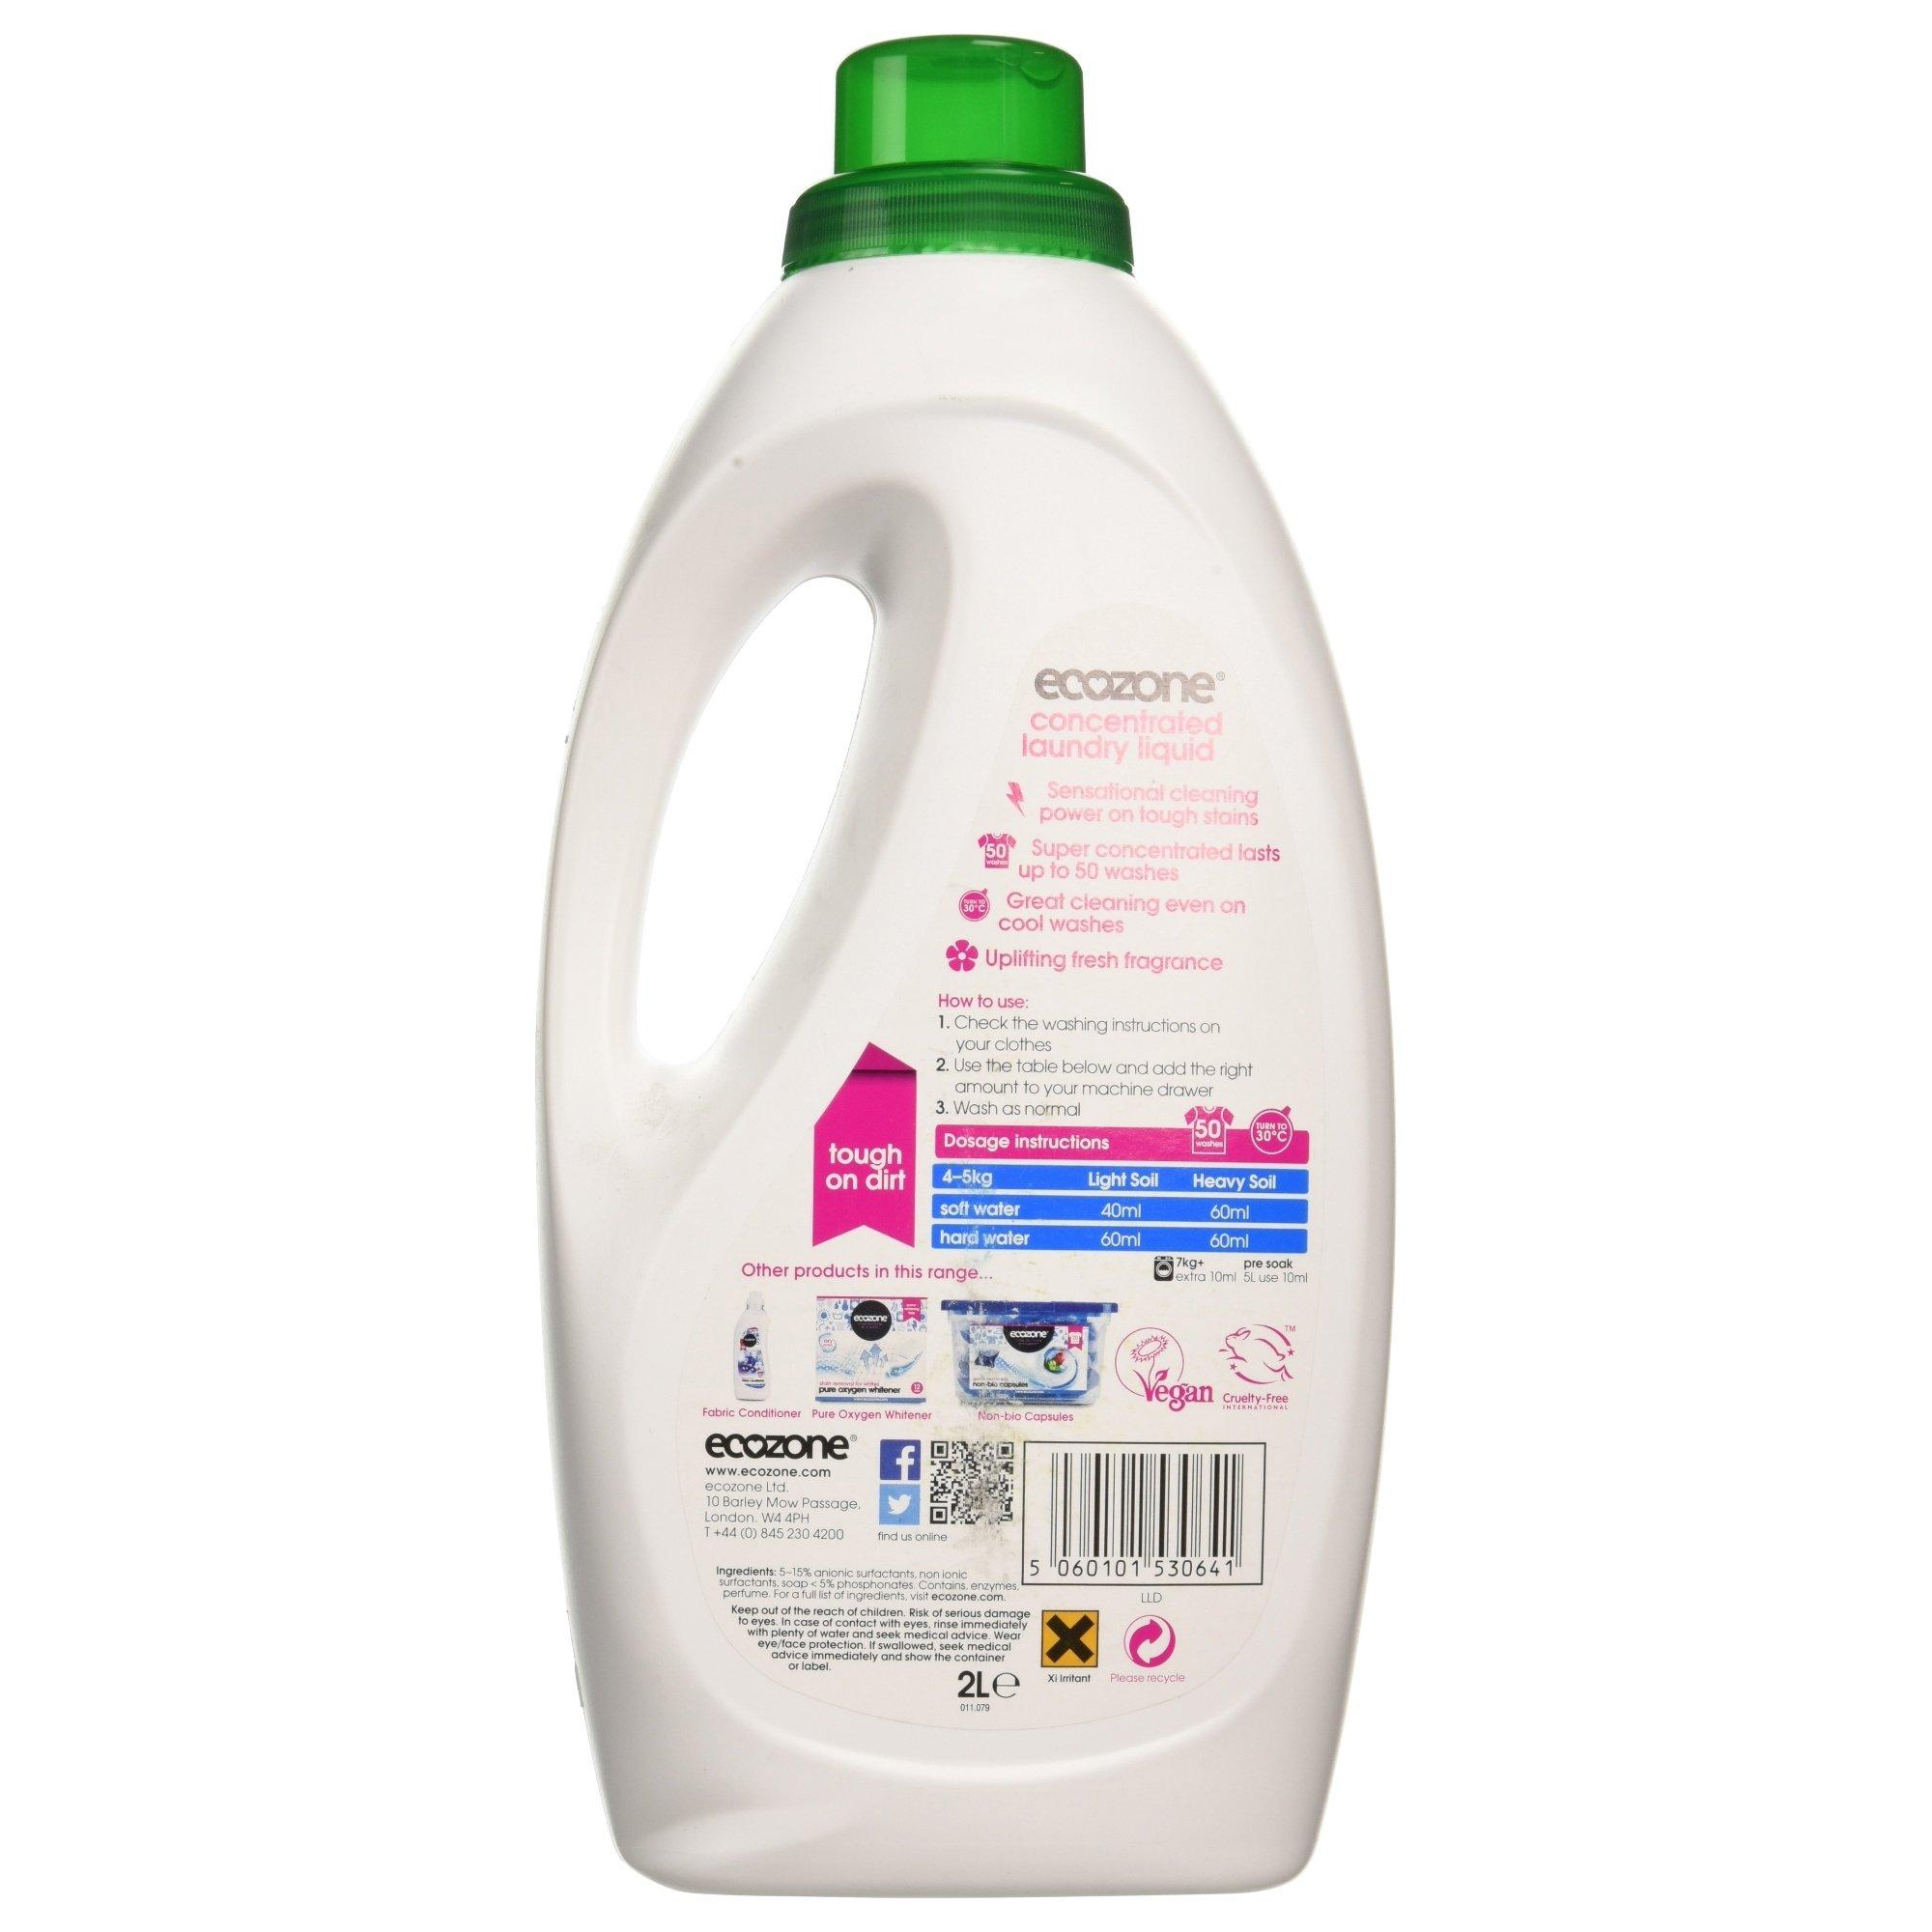 Ecozone - Concentrated Laundry Liquid - 2L